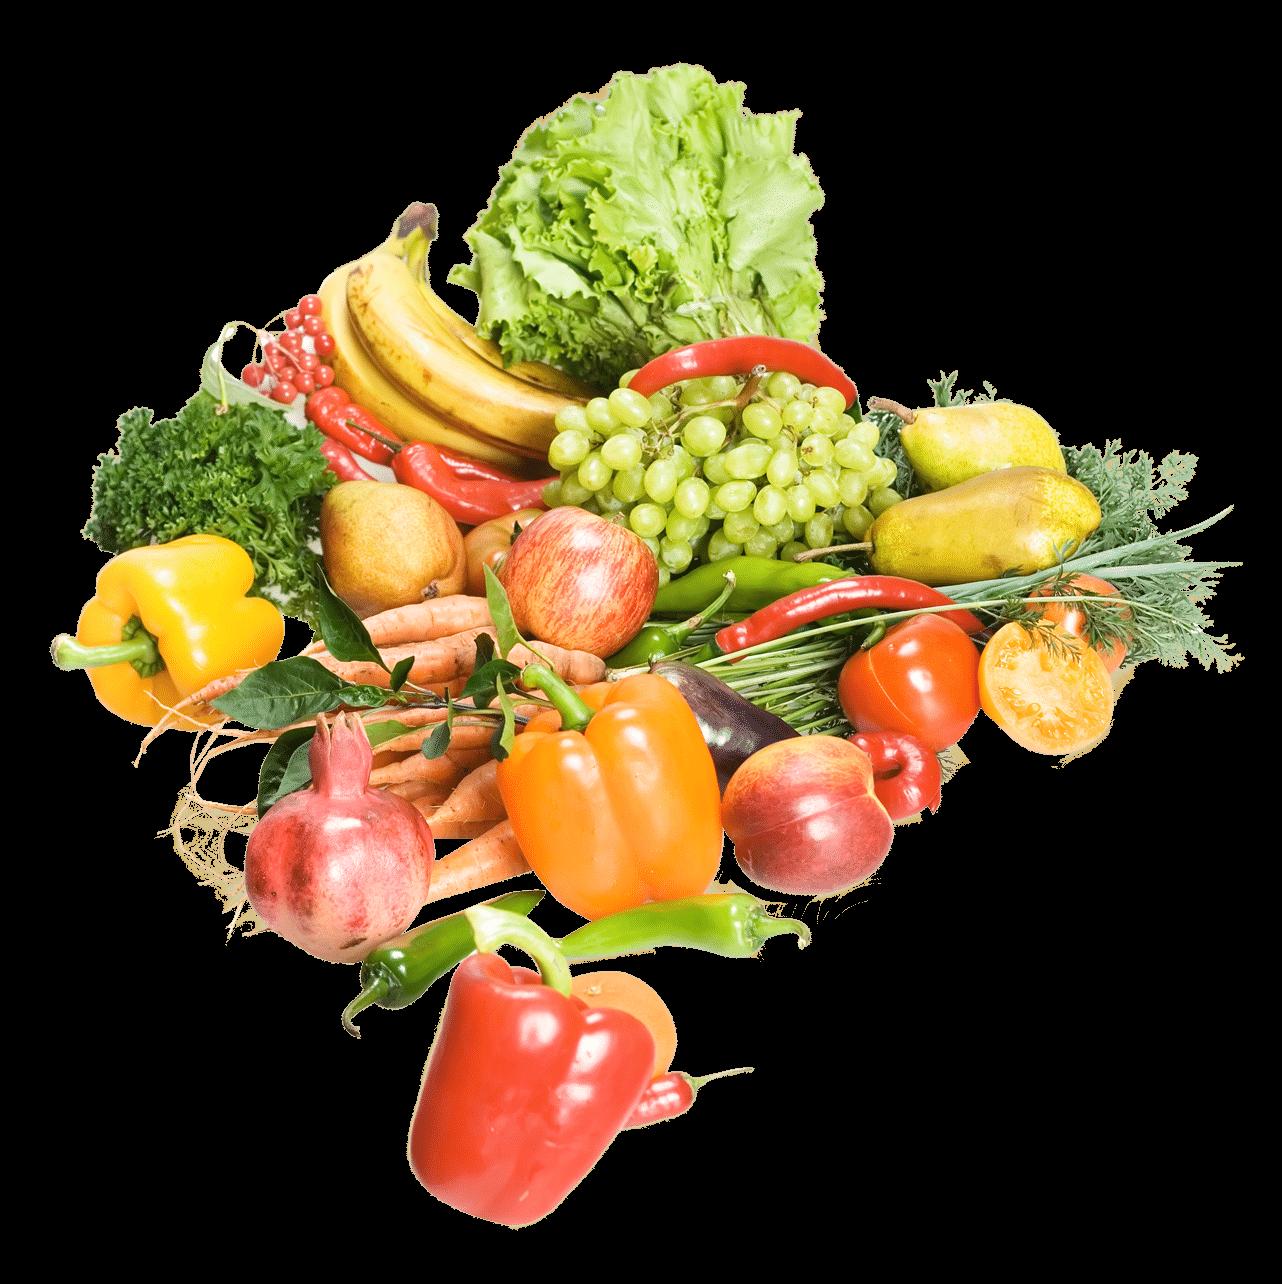 kisspng-vegetable-fruit-bell-pepper-fruits-and-vegetables-5a77b3d061cfb2.5348330915177942564007